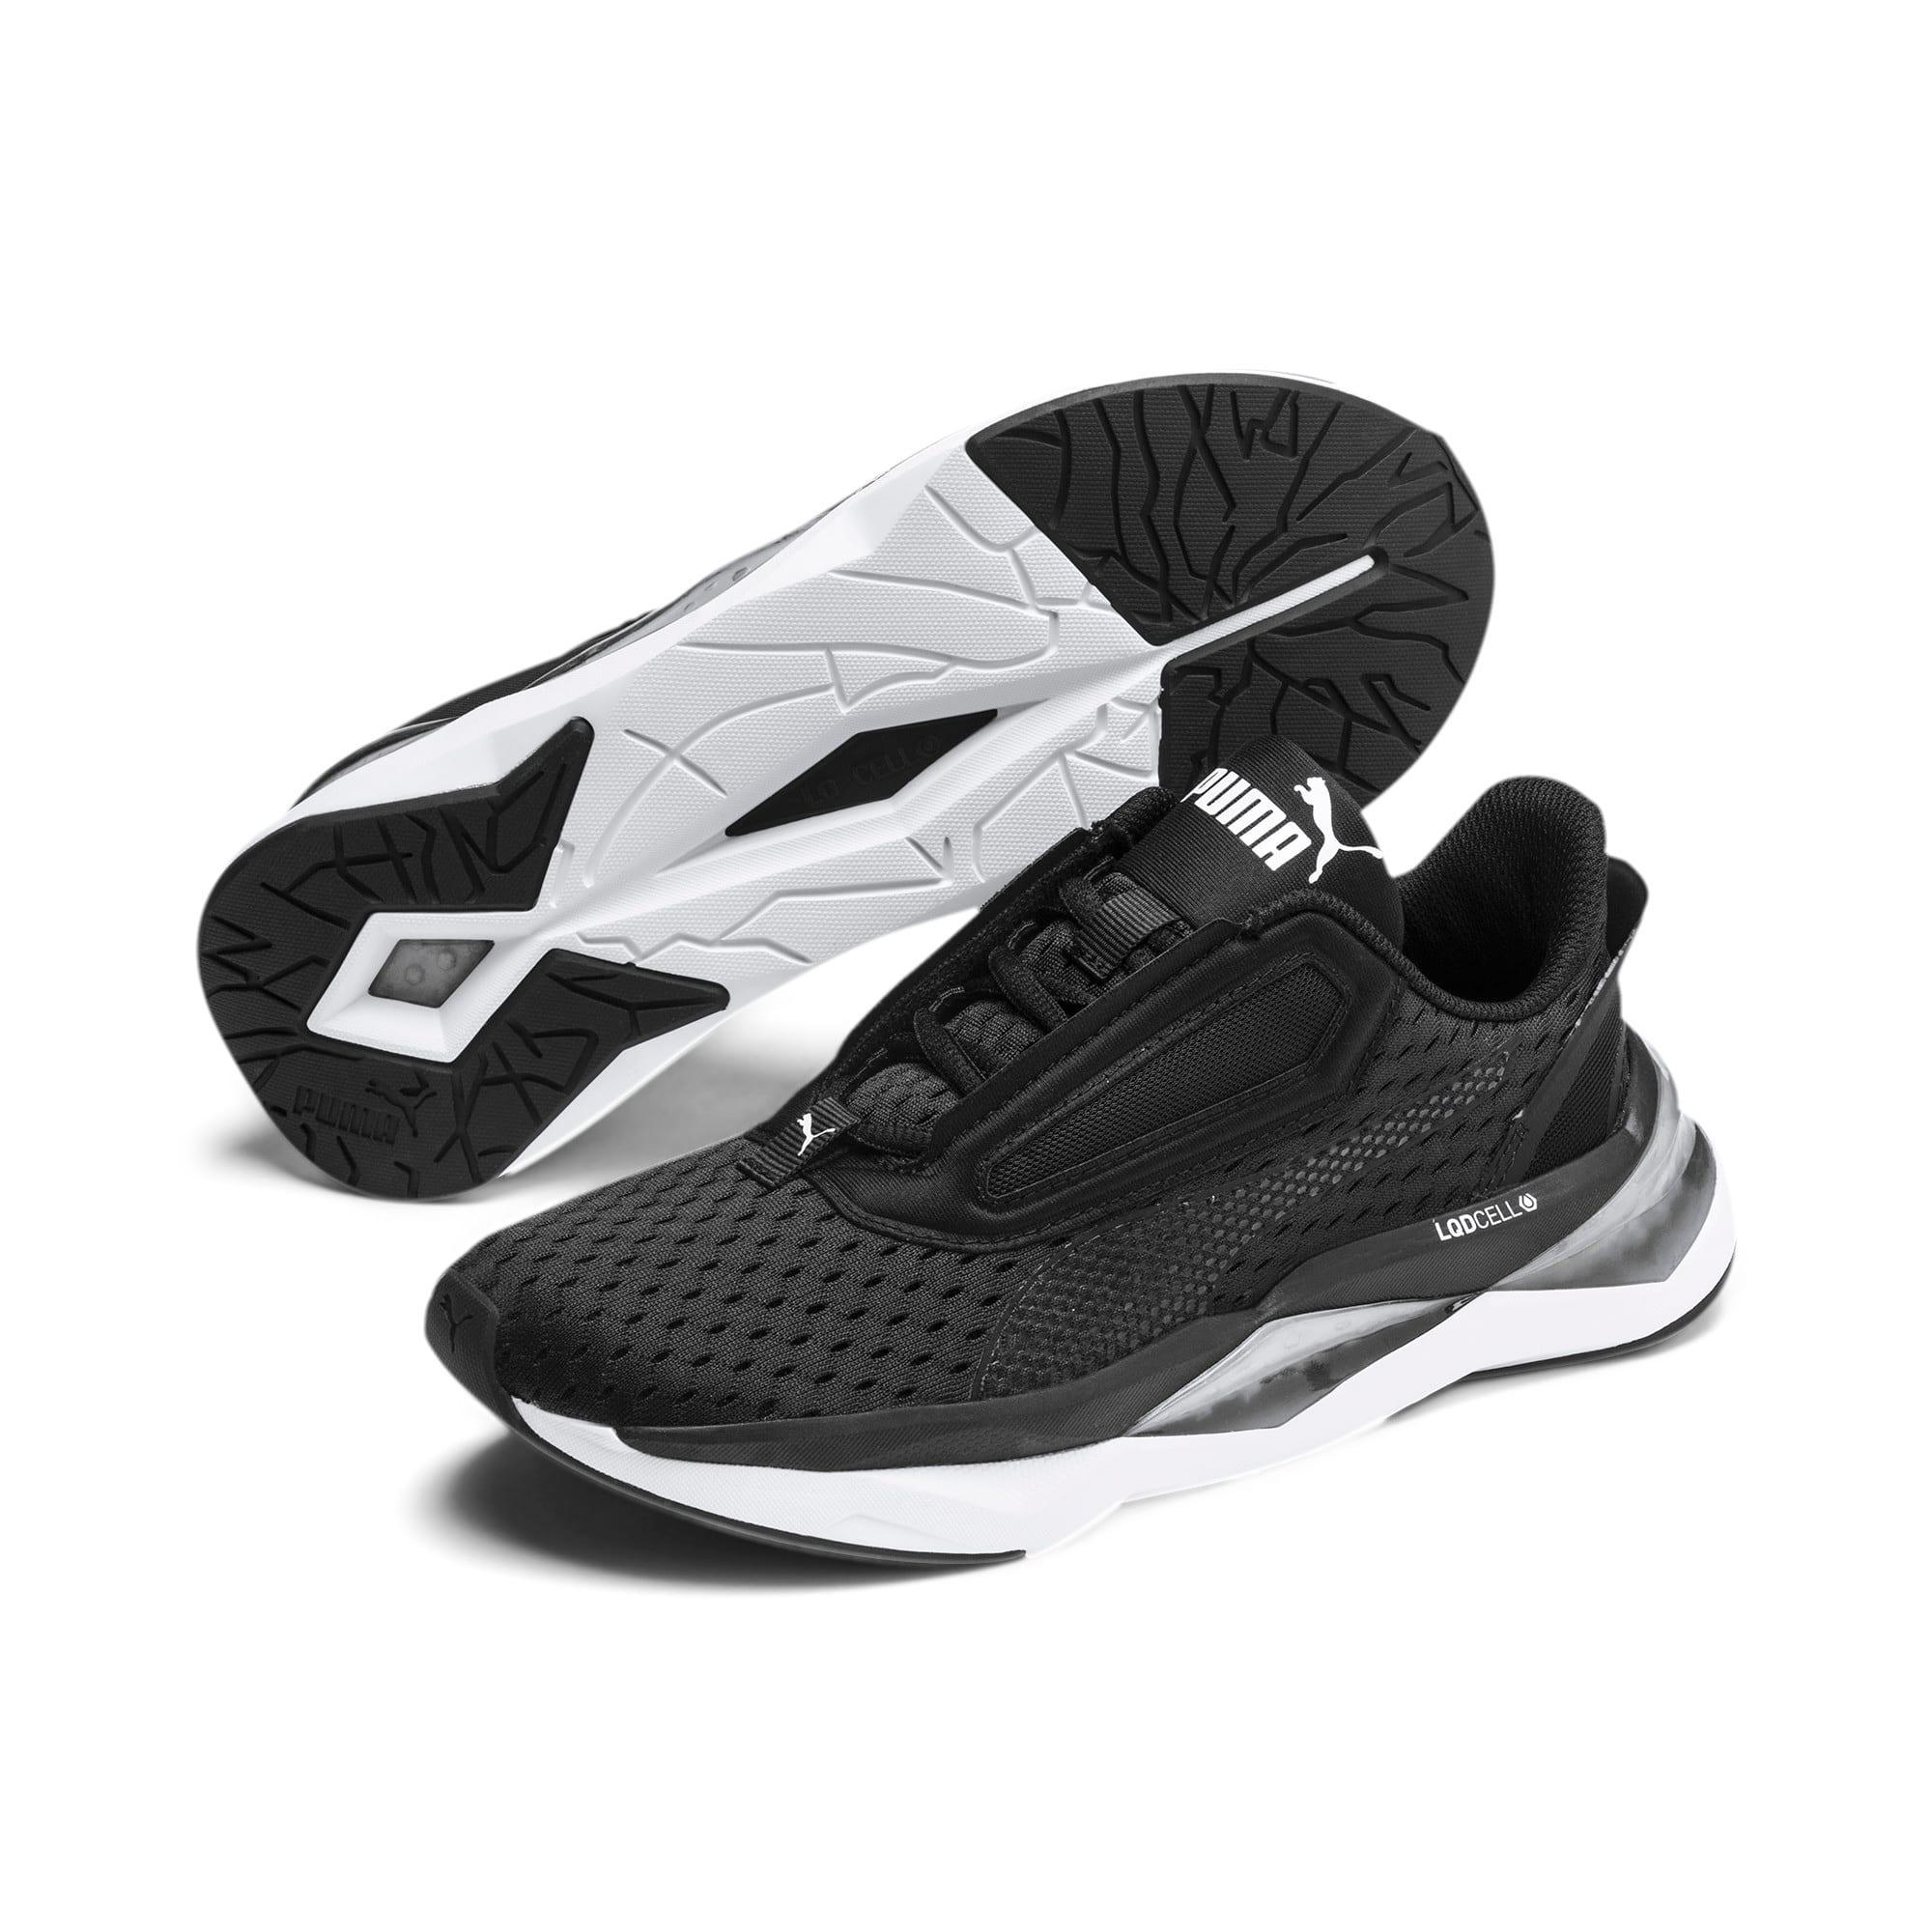 Miniatura 3 de Zapatos deentrenamiento LQDCELL Shatter XT para mujer, Puma Black-Puma White, mediano